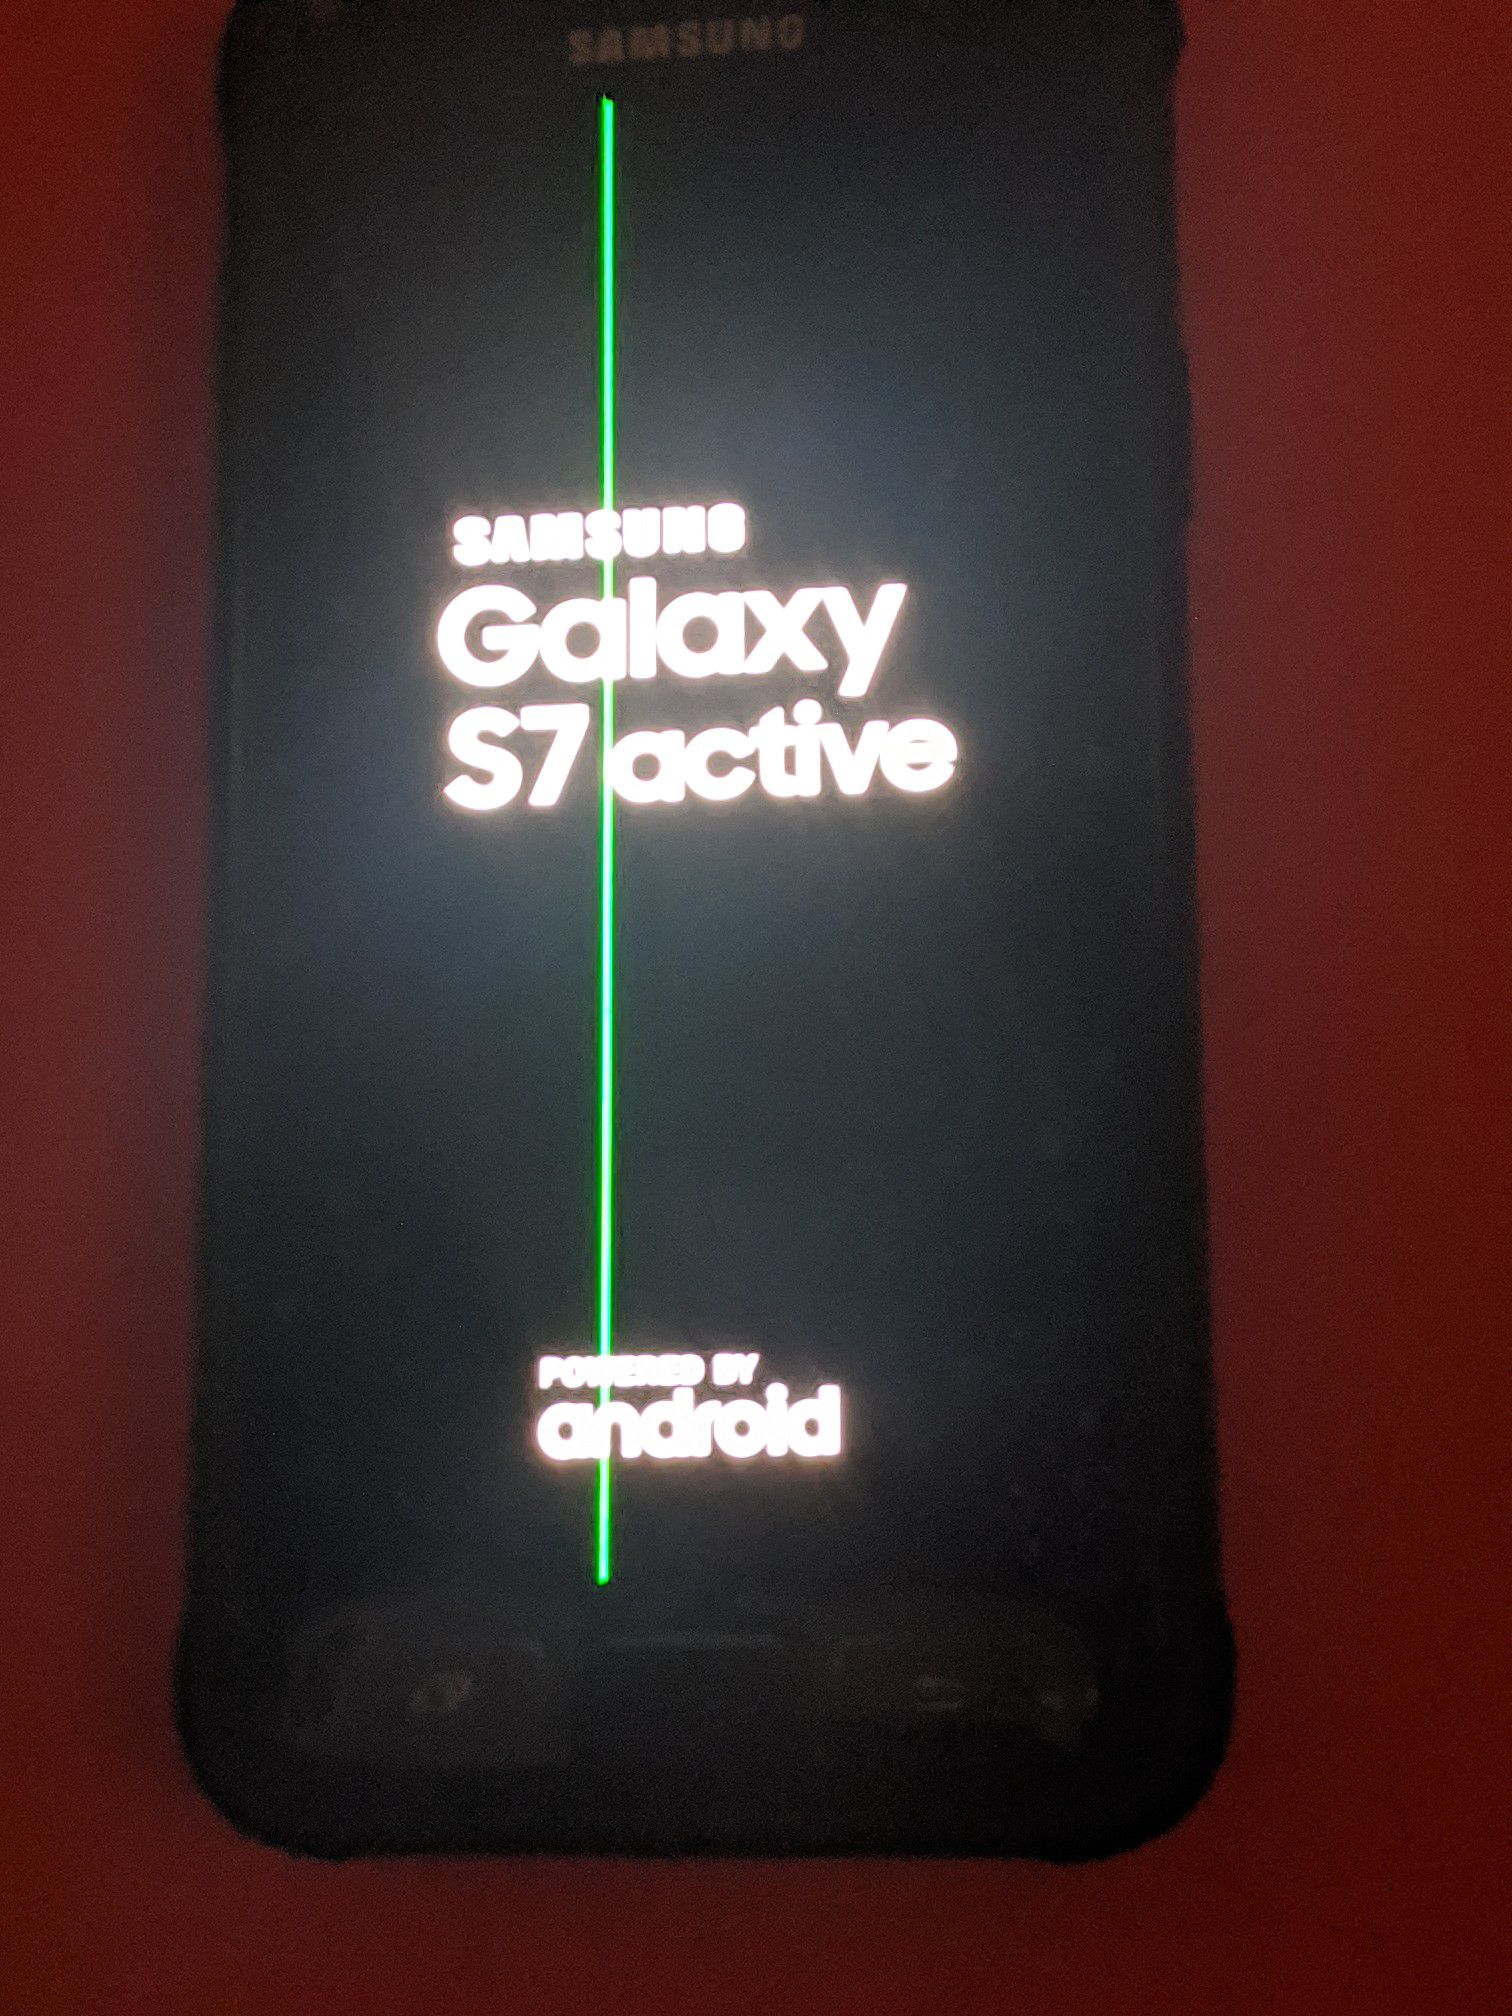 Samsung Galaxy S7 active unlocked